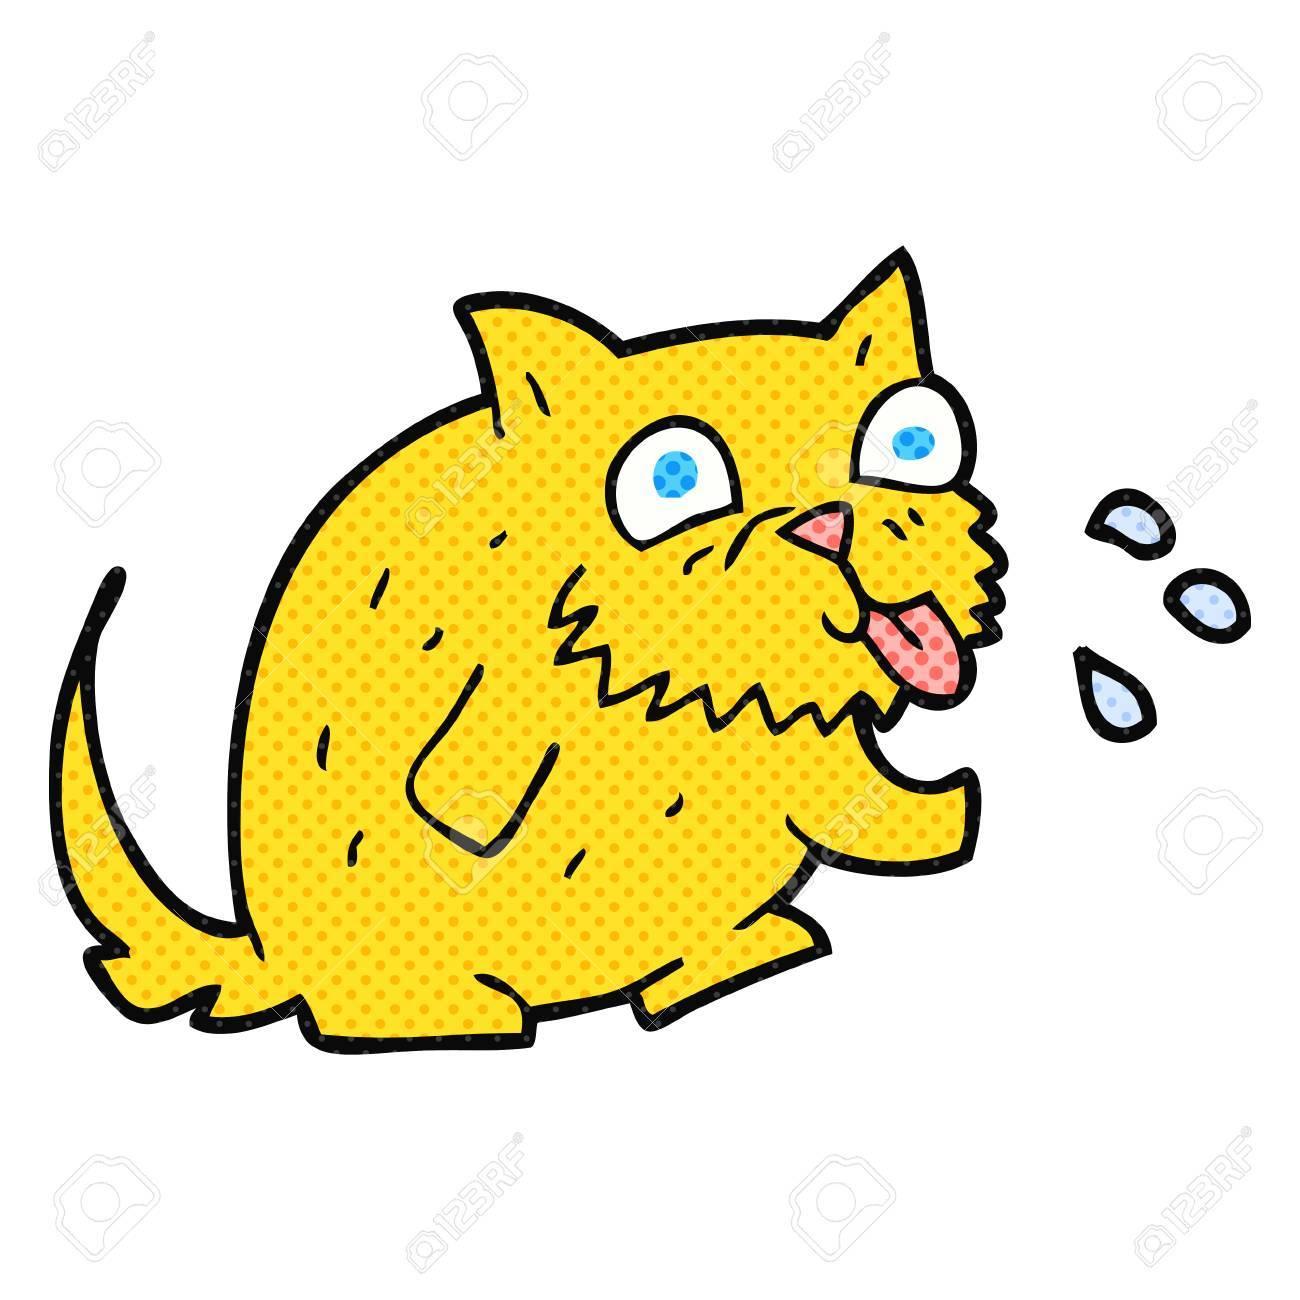 freehand drawn cartoon cat blowing raspberry.